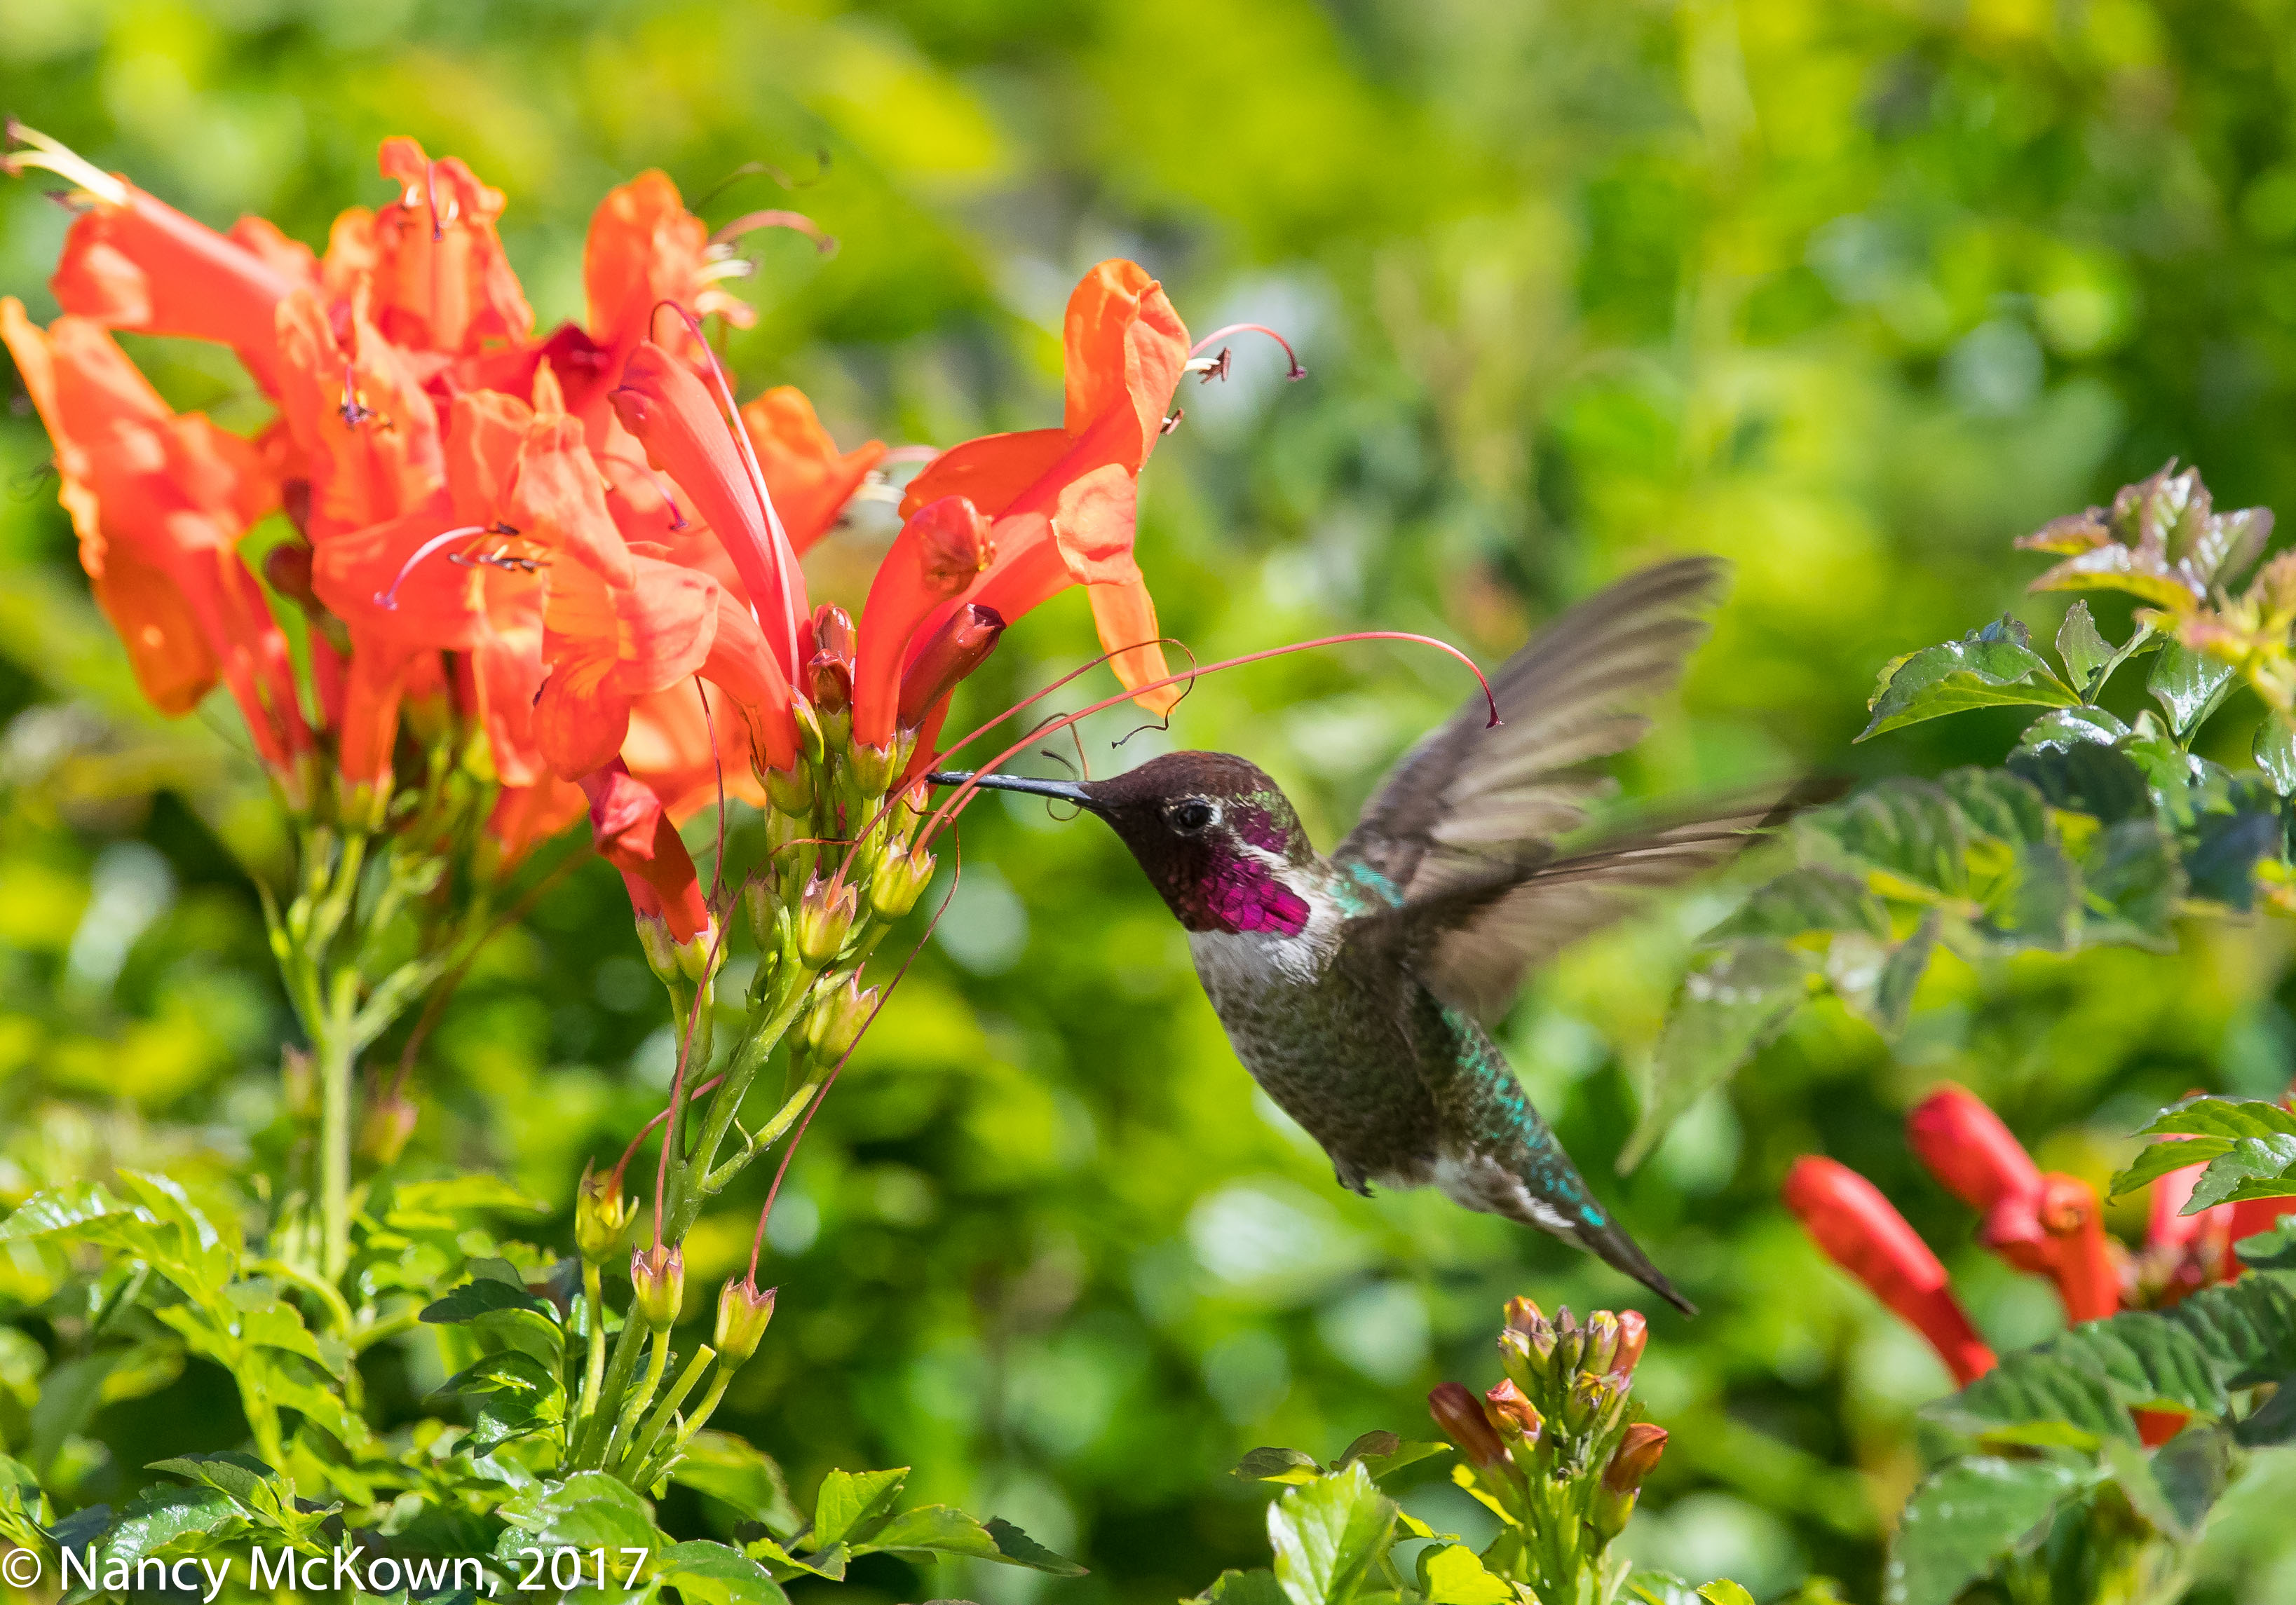 Photo of Anna's Hummingbird